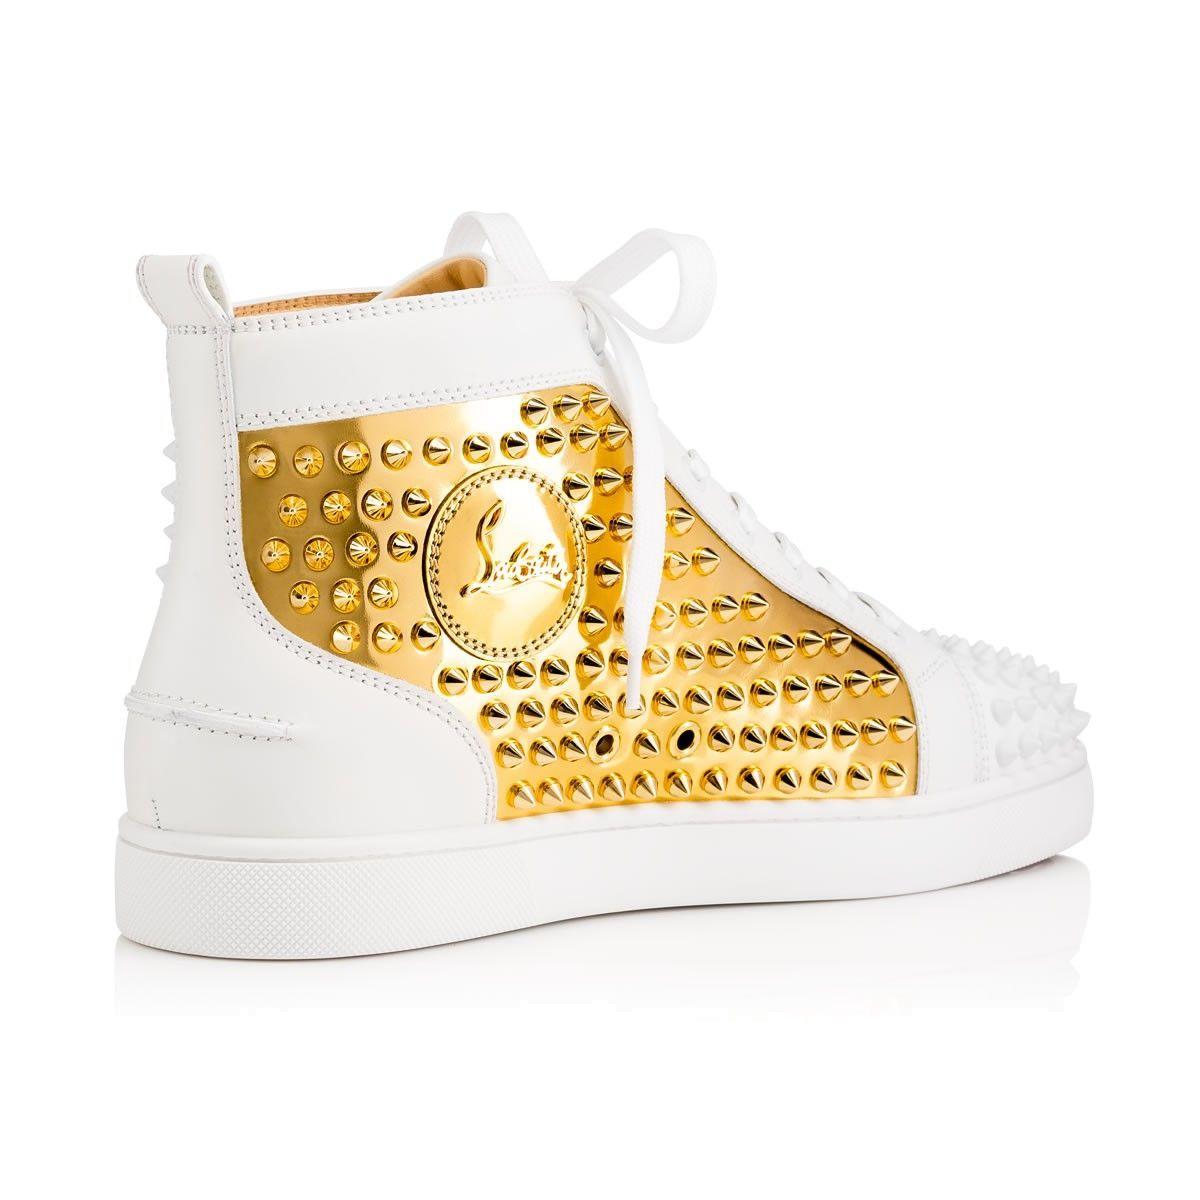 7a017f61cd2 Louis Spikes Men's Flat Latte/Gold Leather - Men Shoes - Christian ...